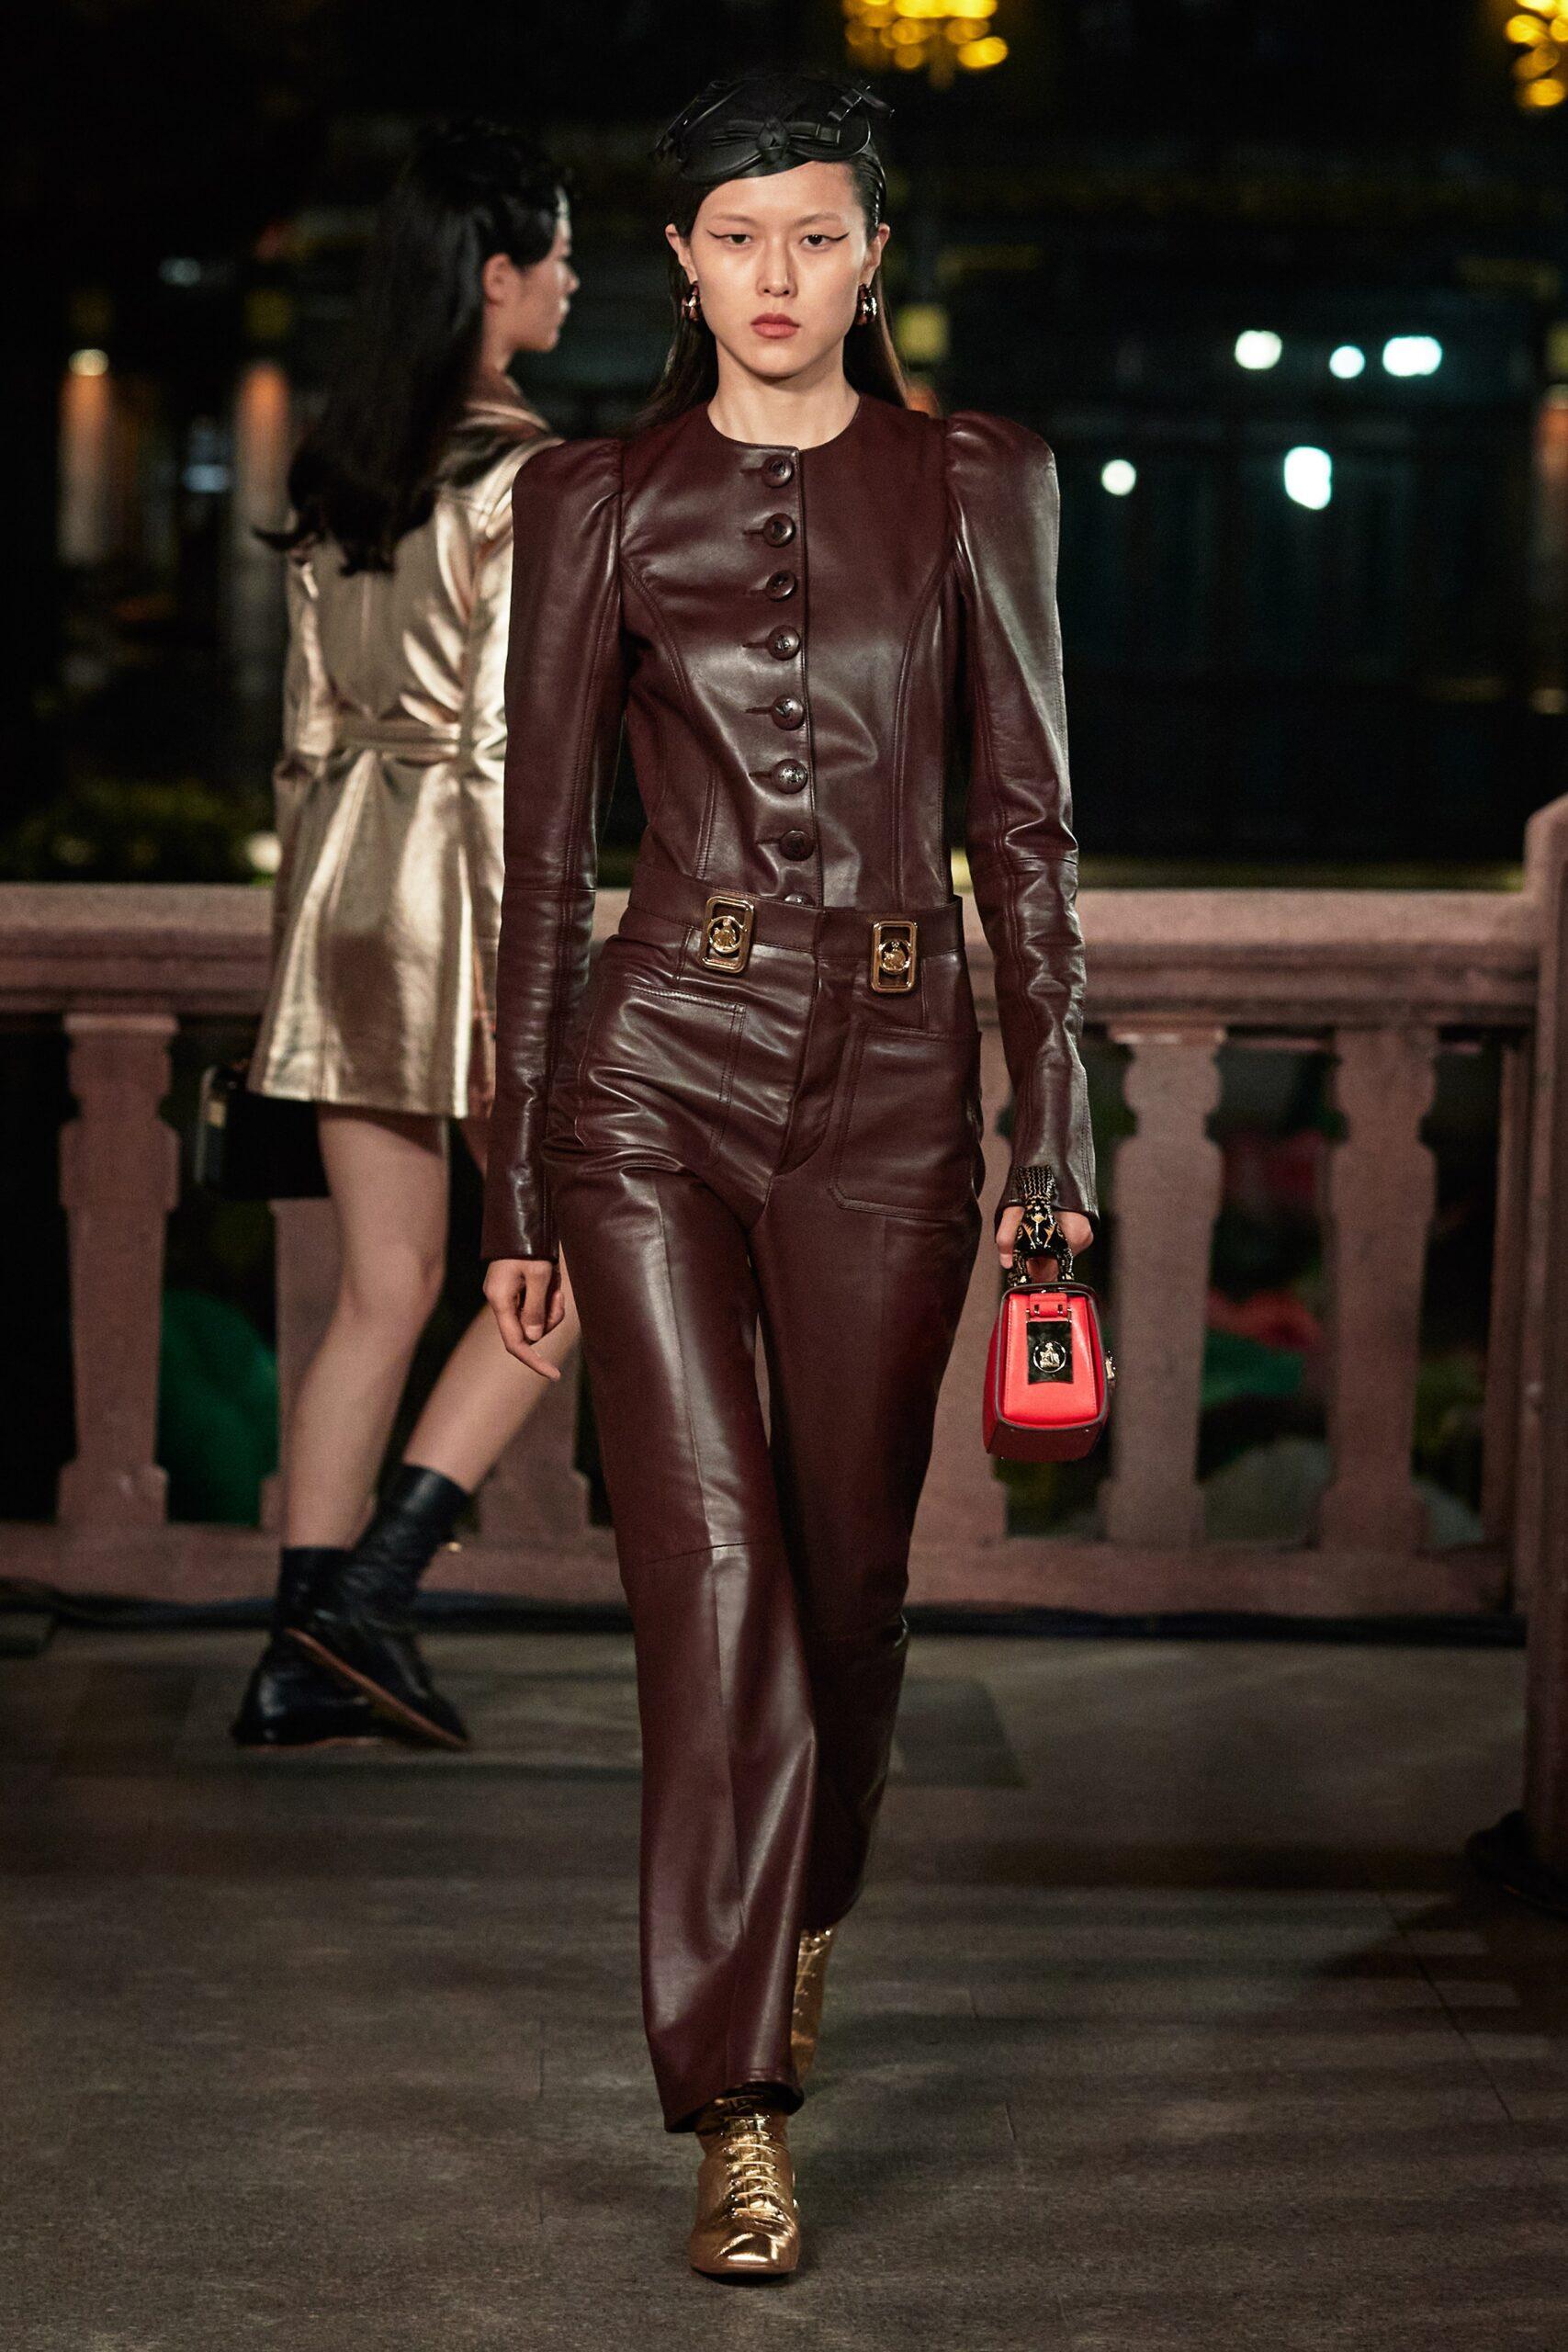 модный кожаный комбинезон